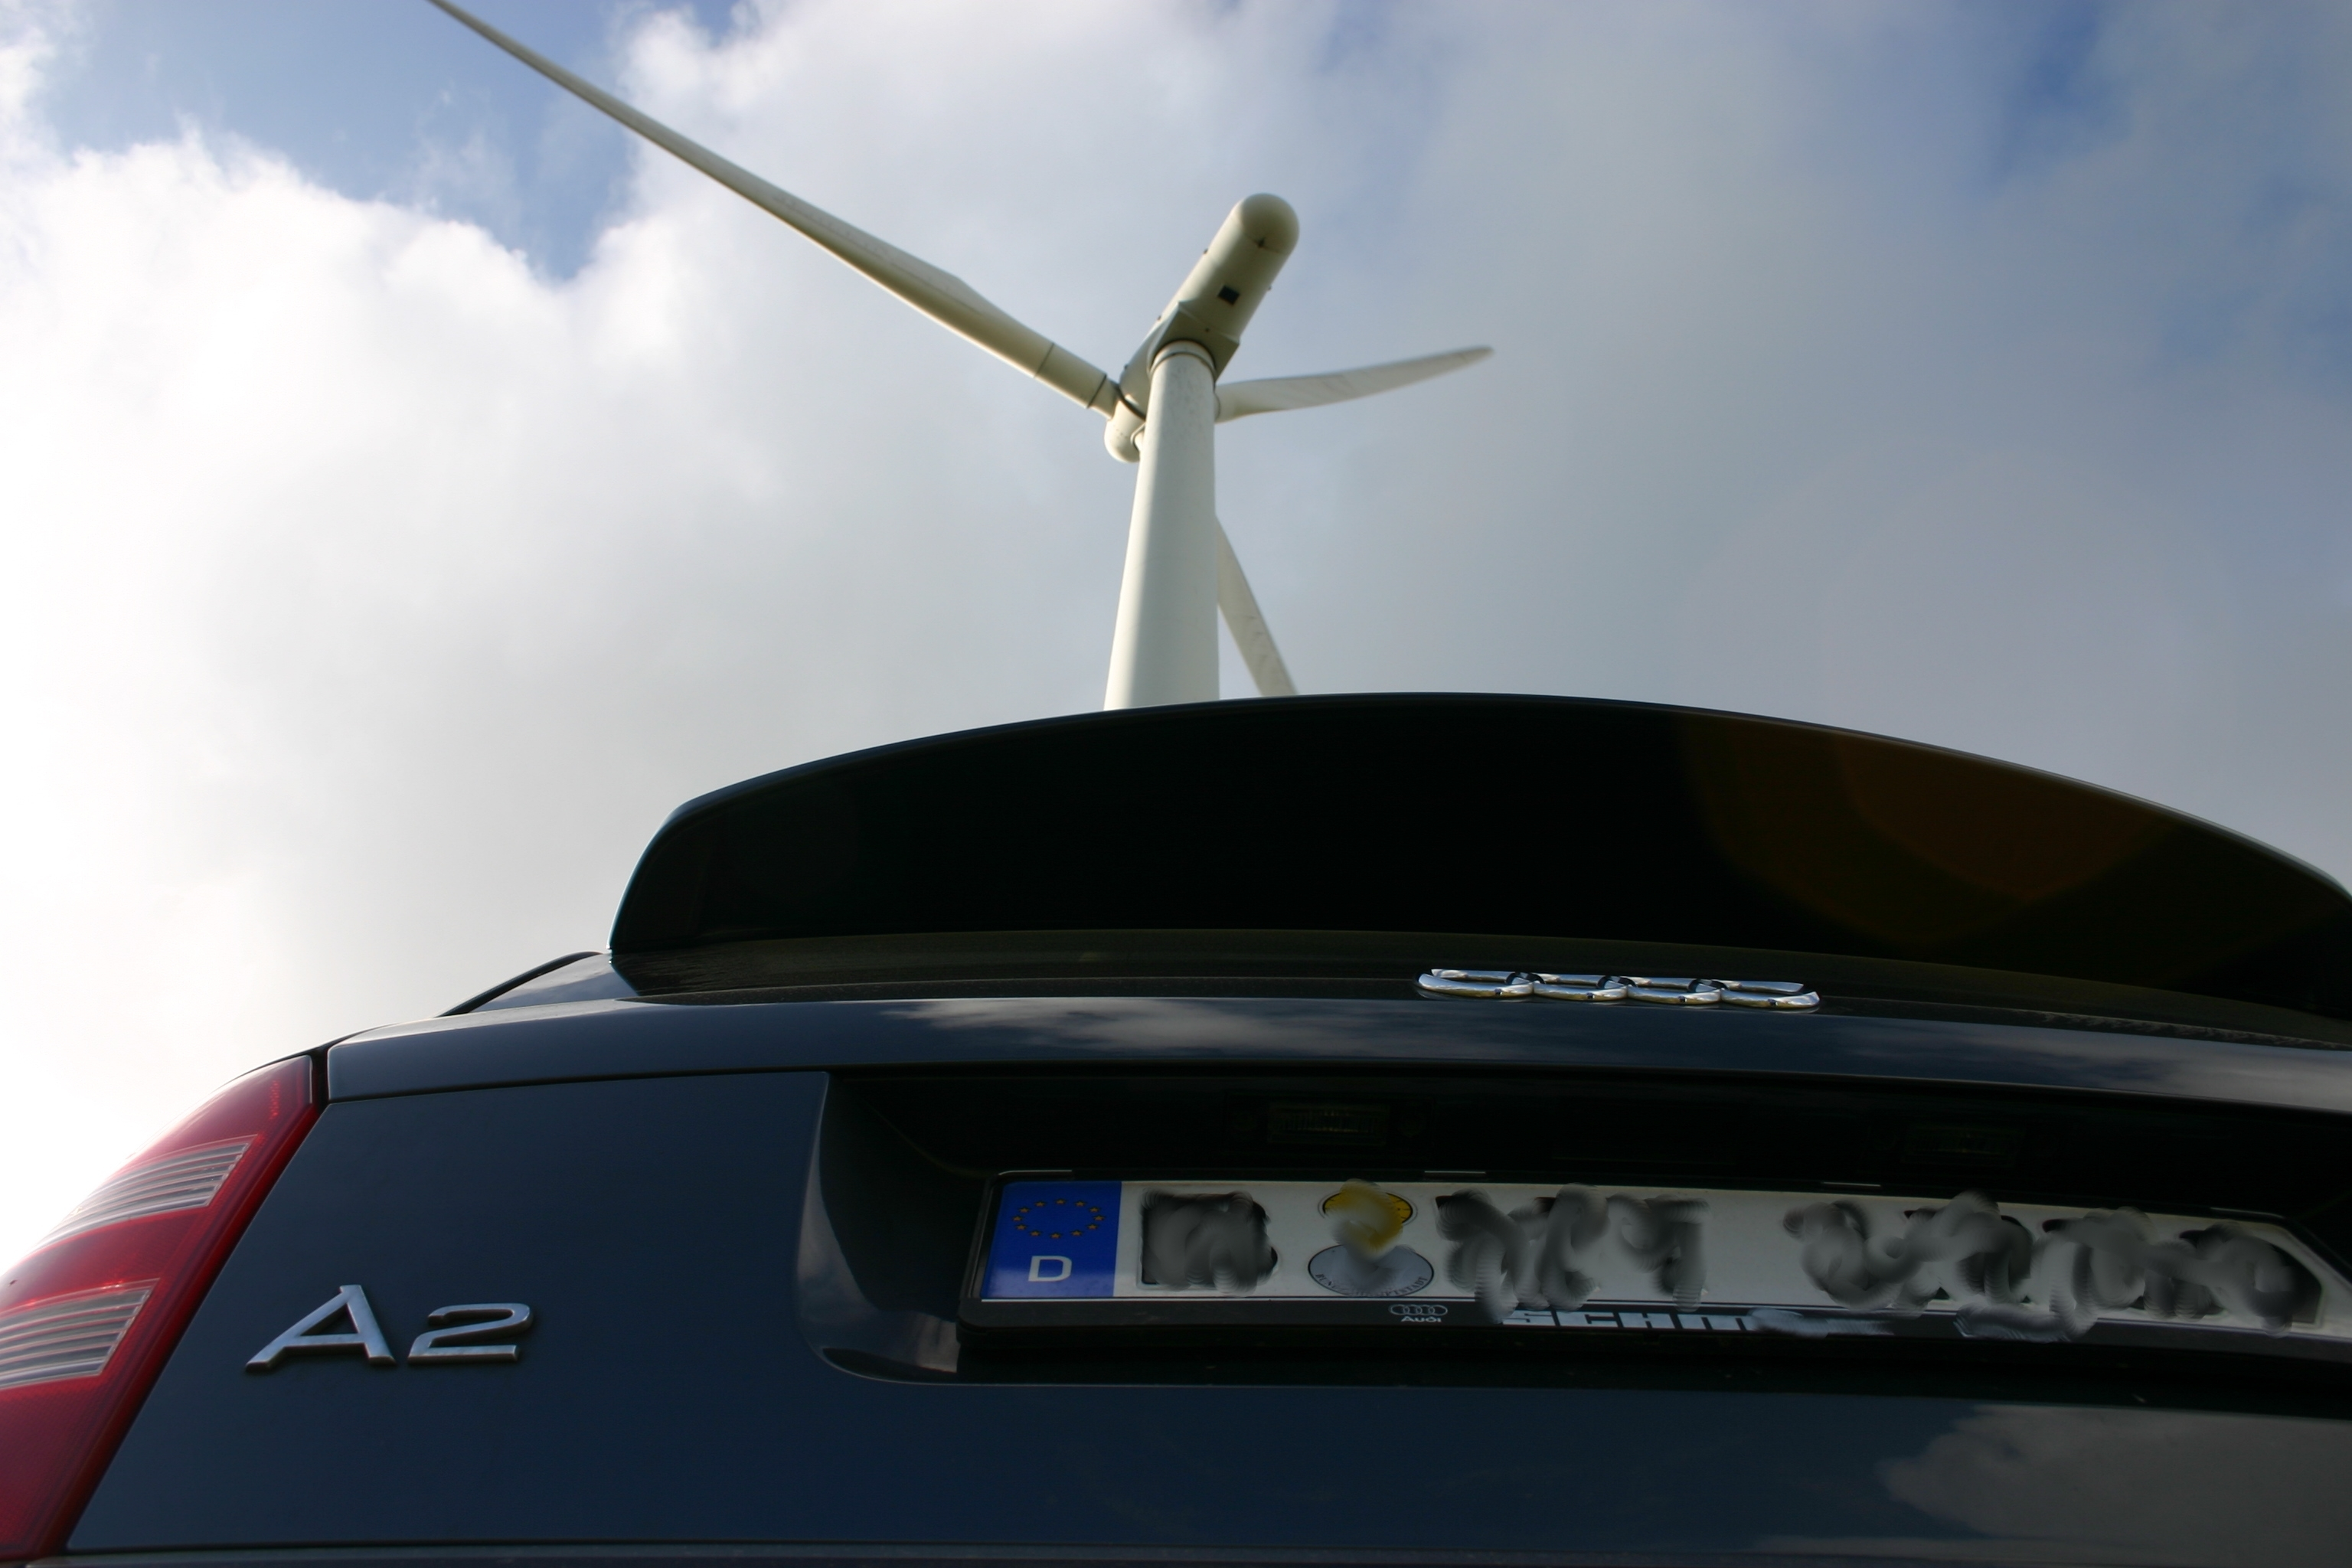 Windkraftrad meets A2